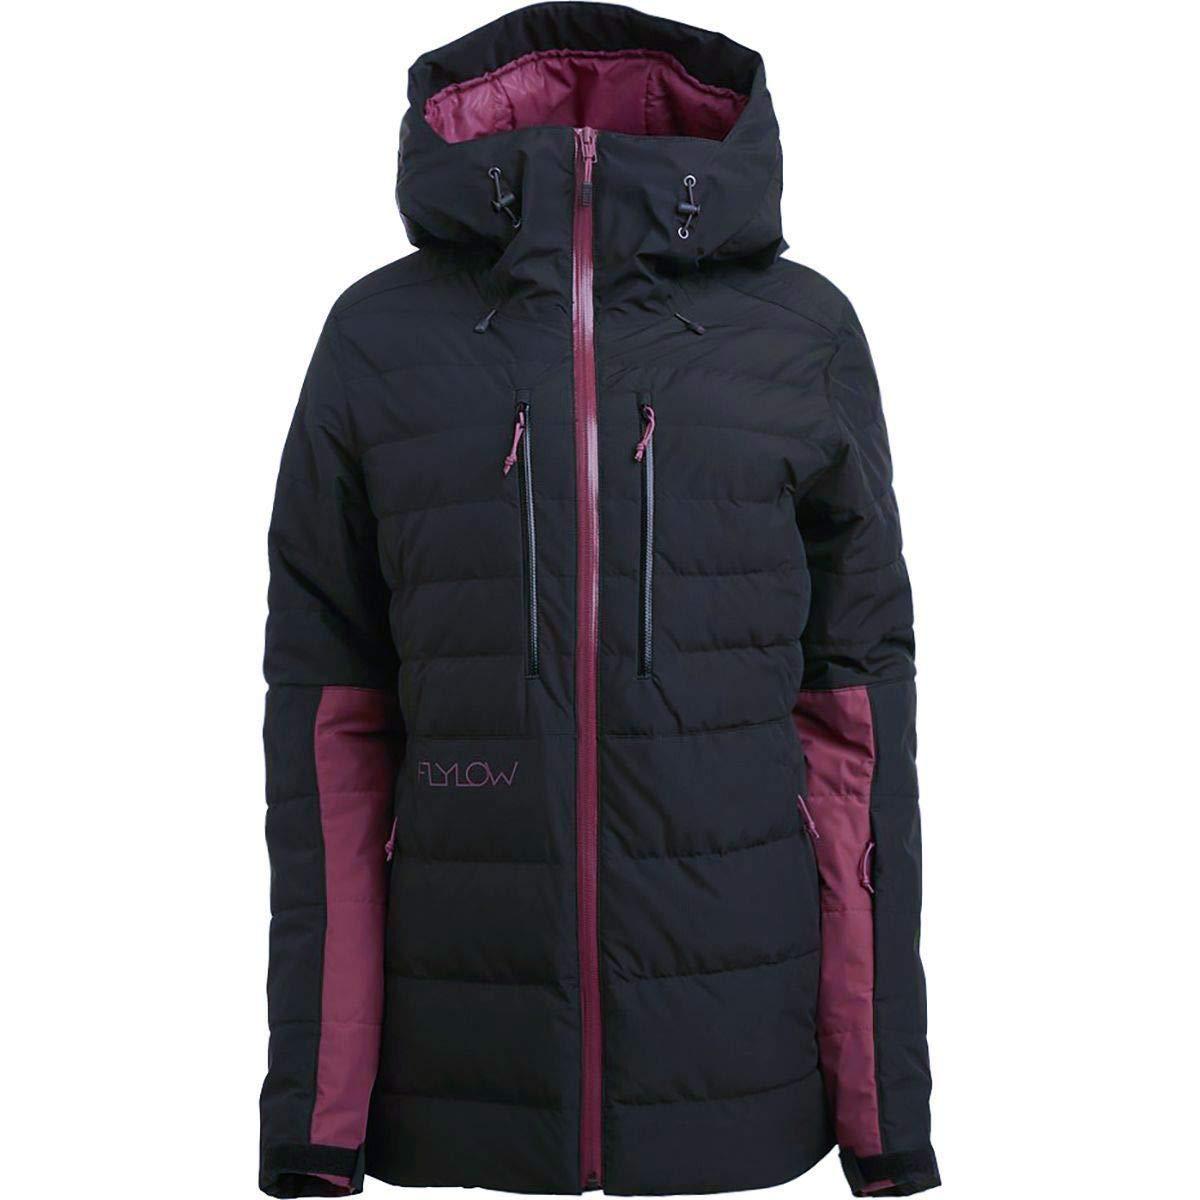 Flylow Jody Down Jacket Womens